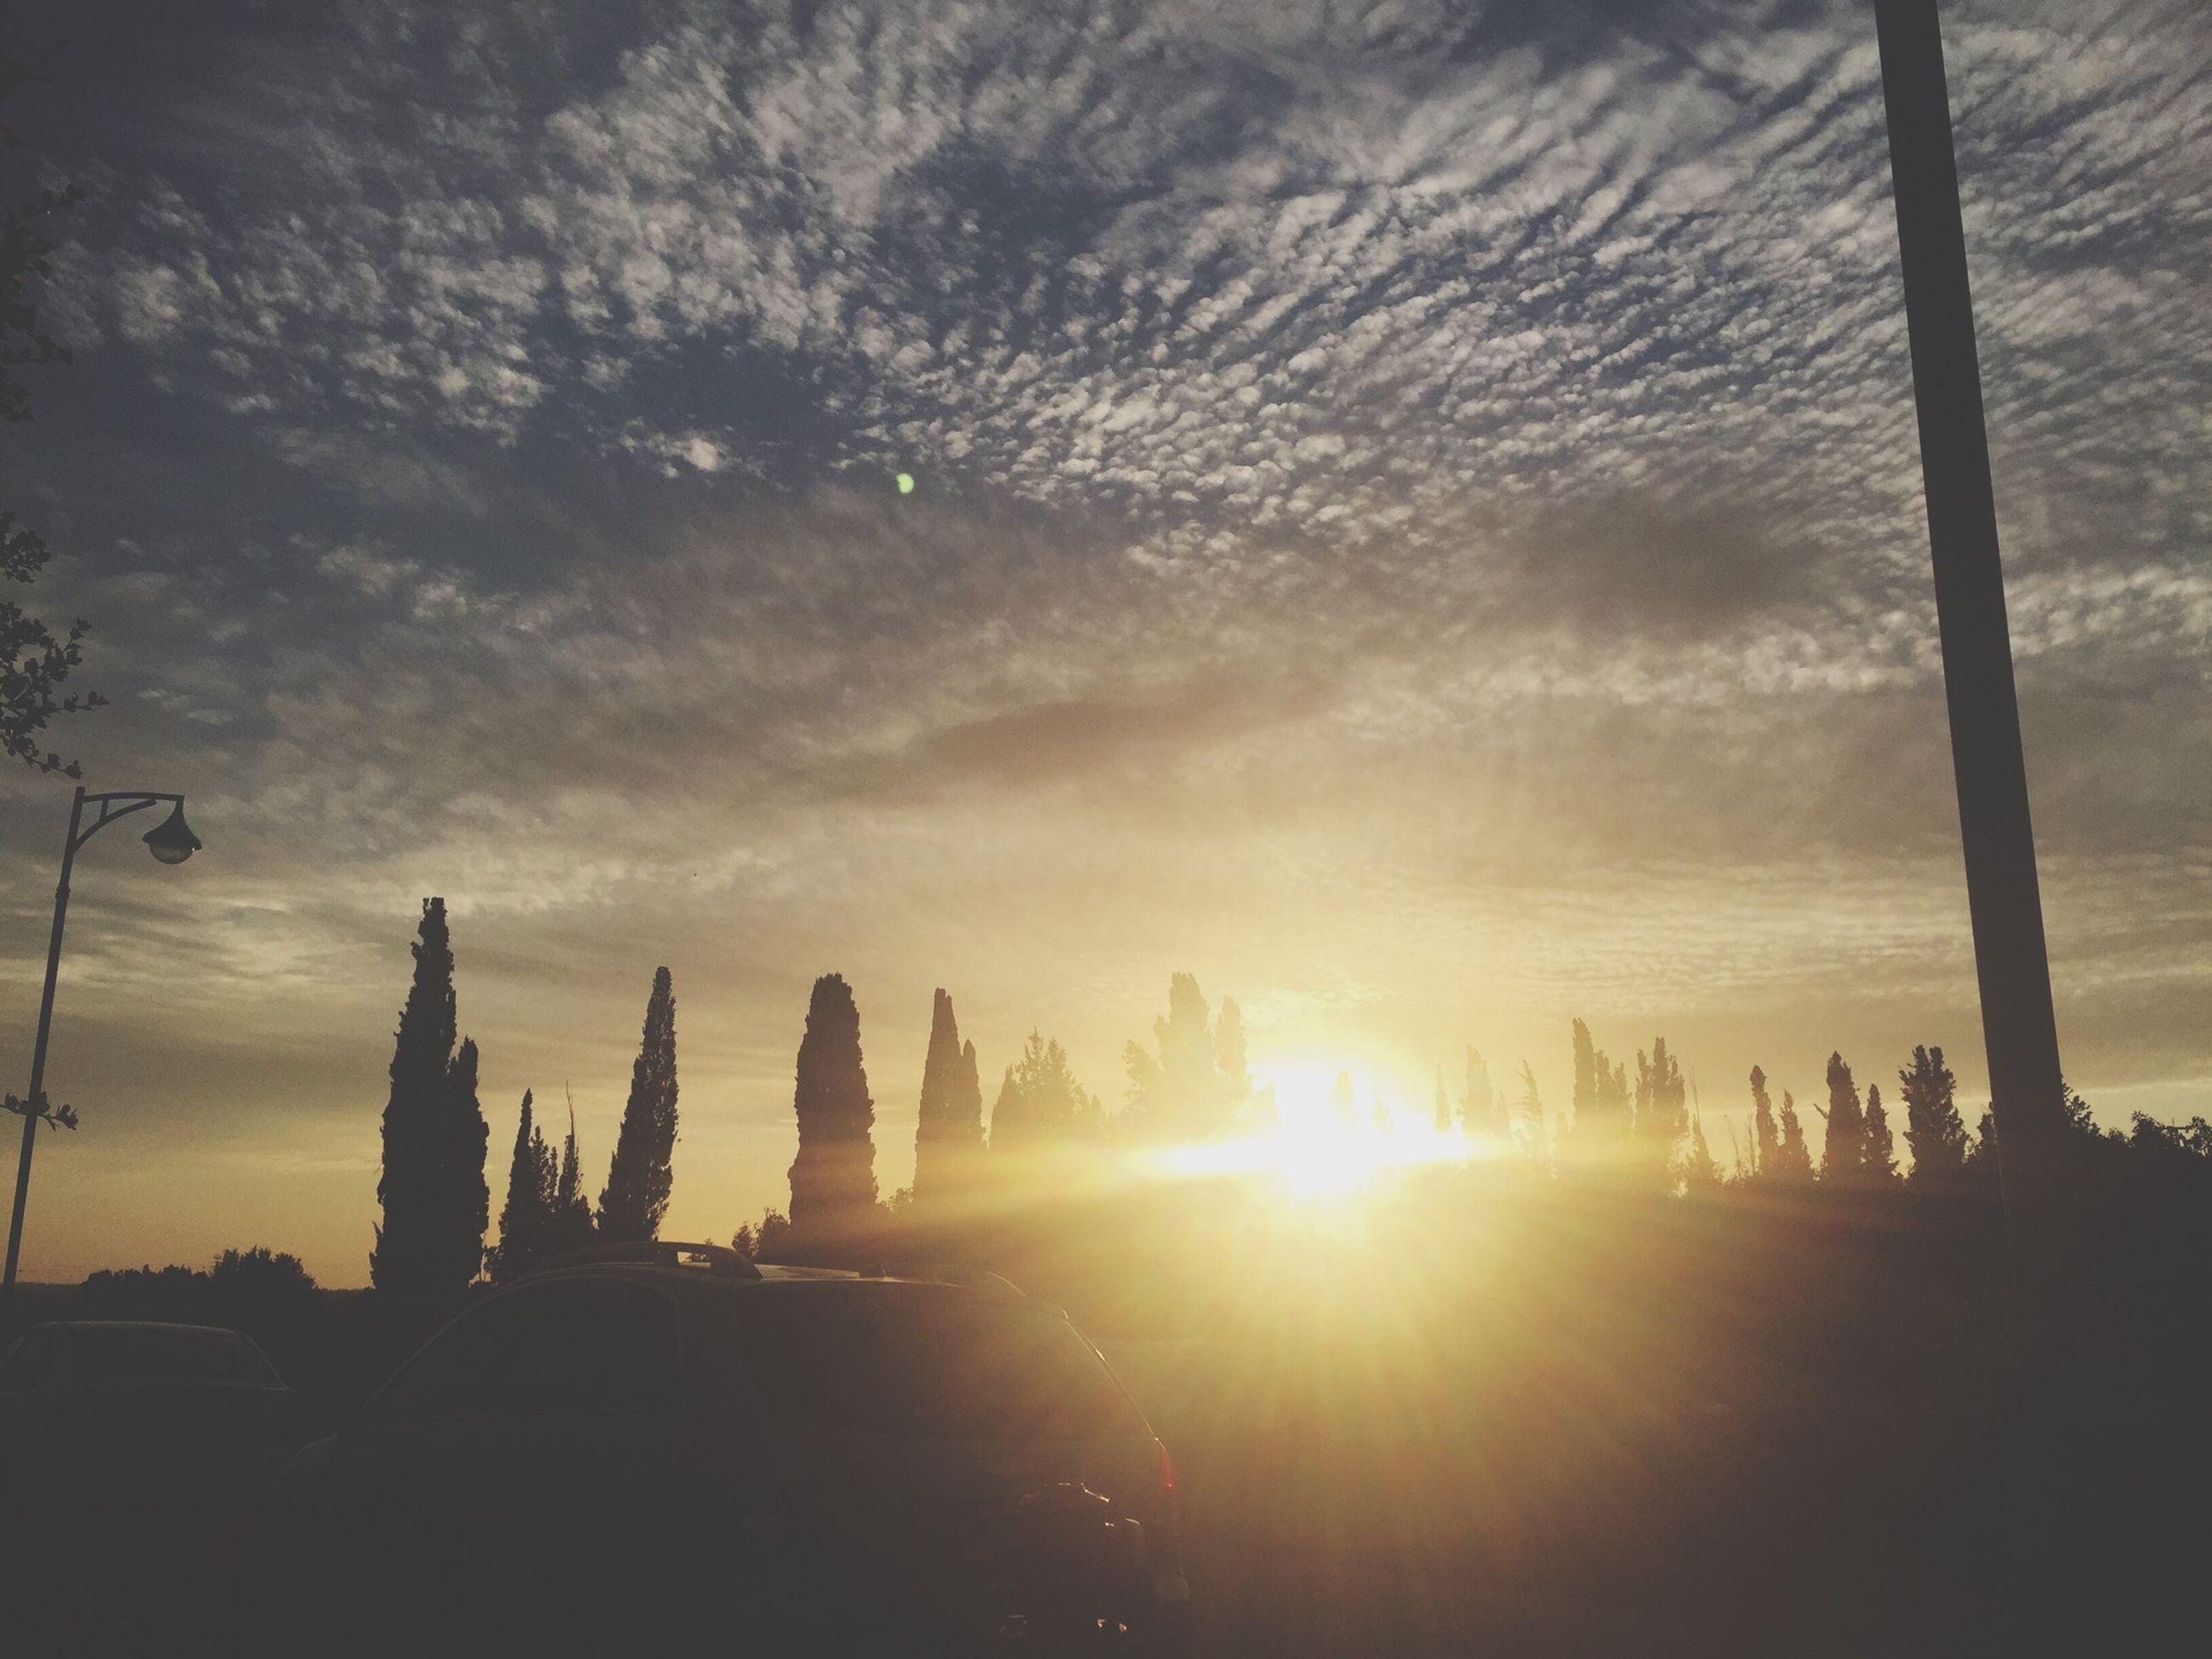 sun, silhouette, sunset, sky, sunbeam, architecture, built structure, cloud - sky, sunlight, lens flare, building exterior, low angle view, back lit, cloud, travel destinations, outdoors, nature, cloudy, religion, tree